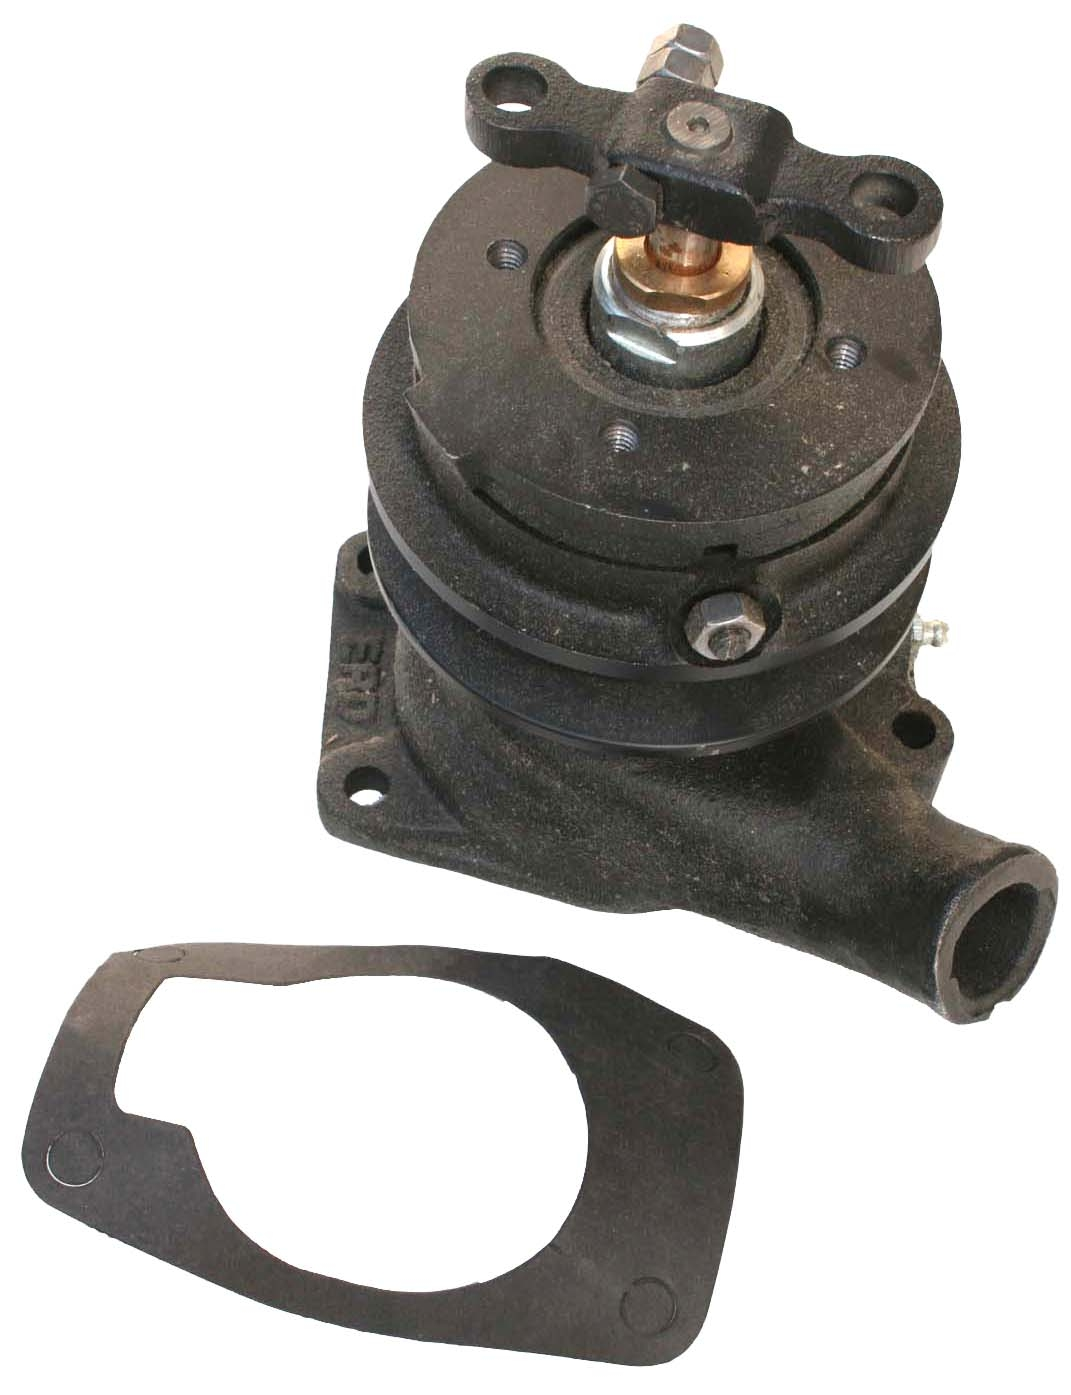 Thermostat - Case IH Parts - Case IH Tractor Parts